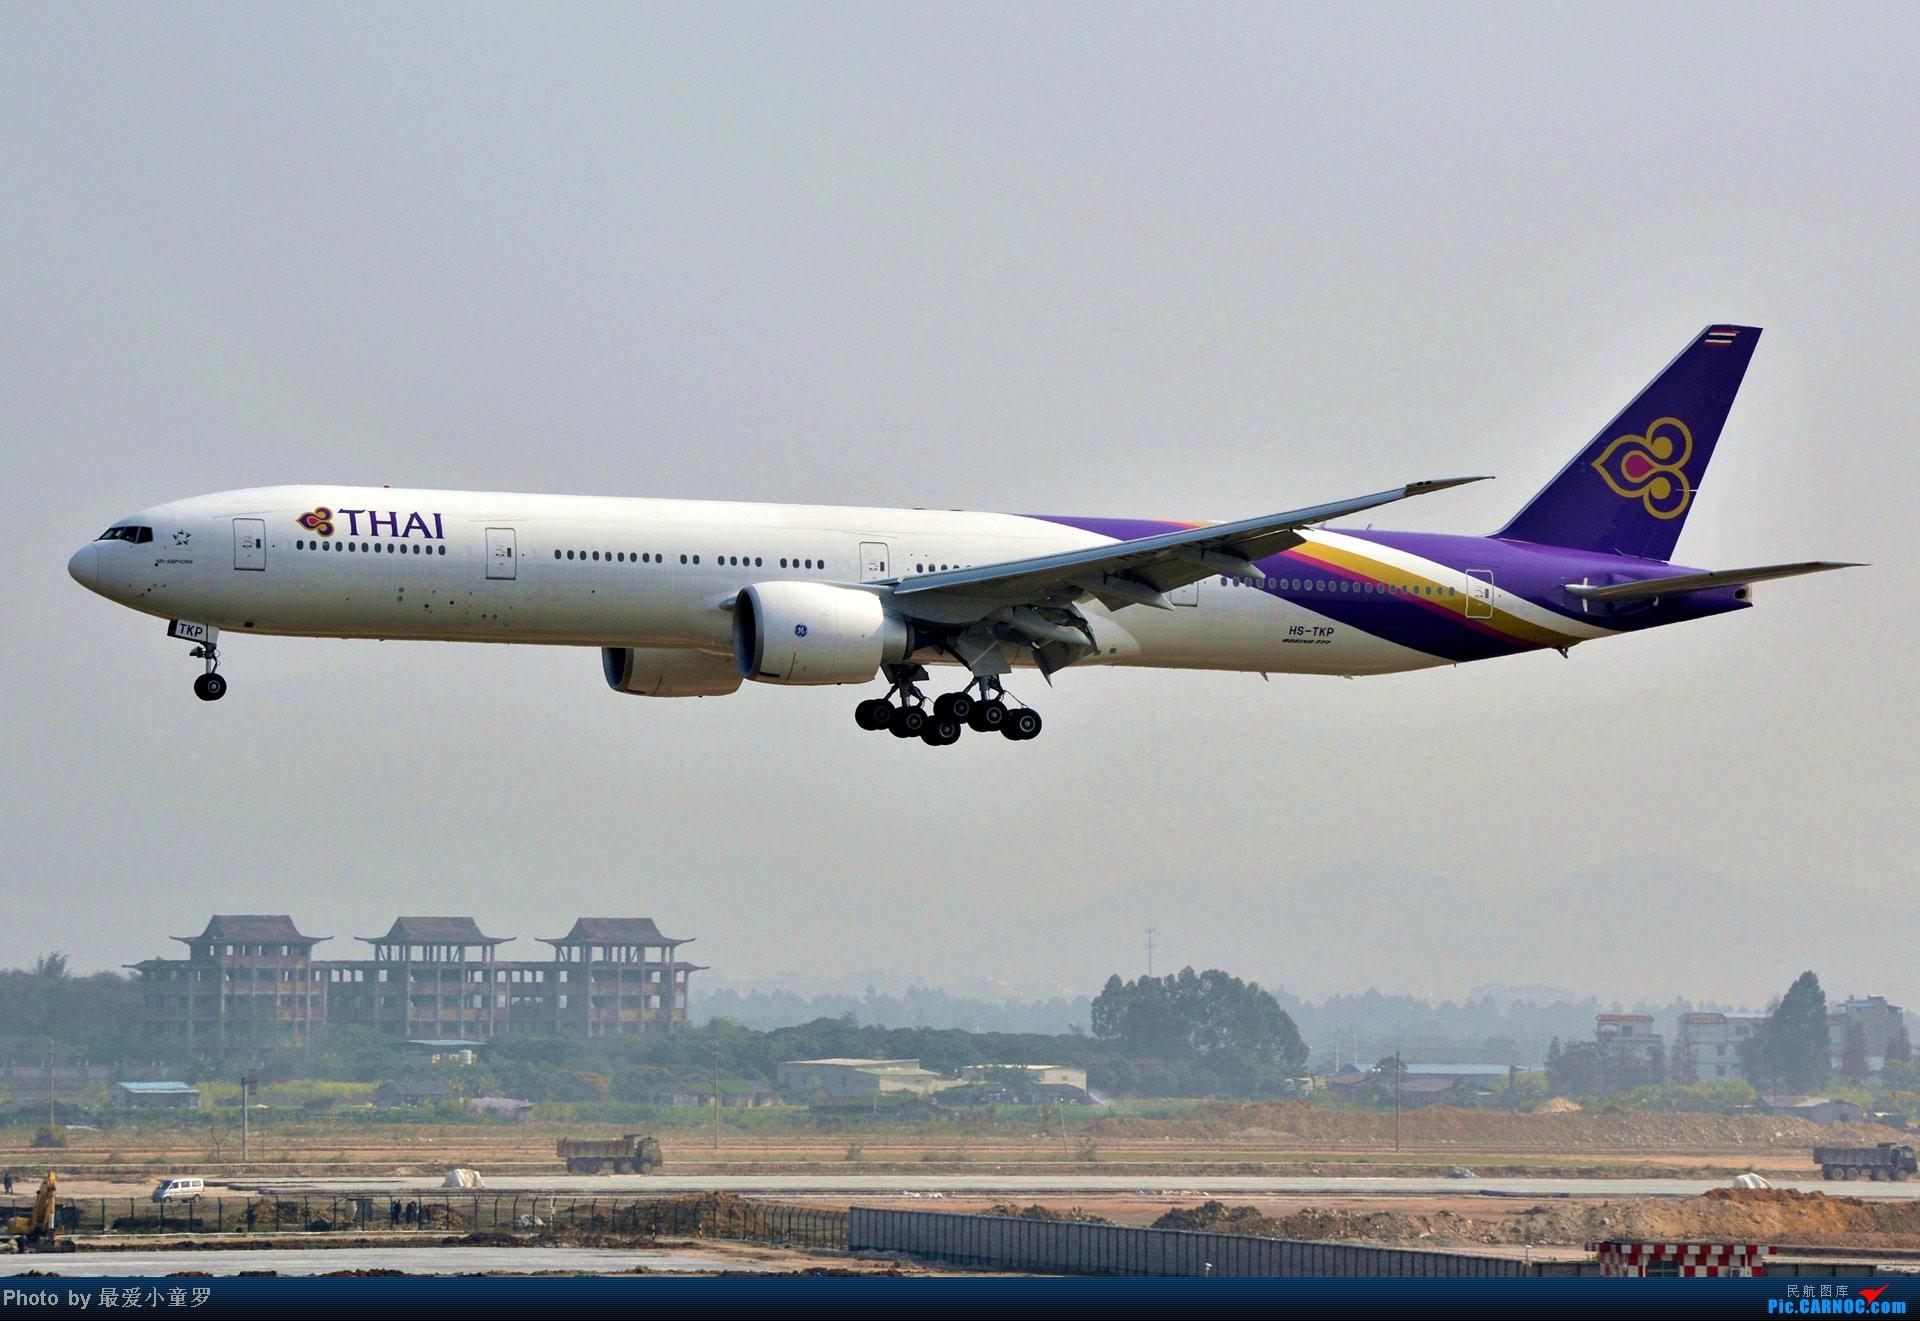 Re:[原创]好天拍机,去年12月21日广州消防塔拍机 BOEING 777-300ER HS-TKP